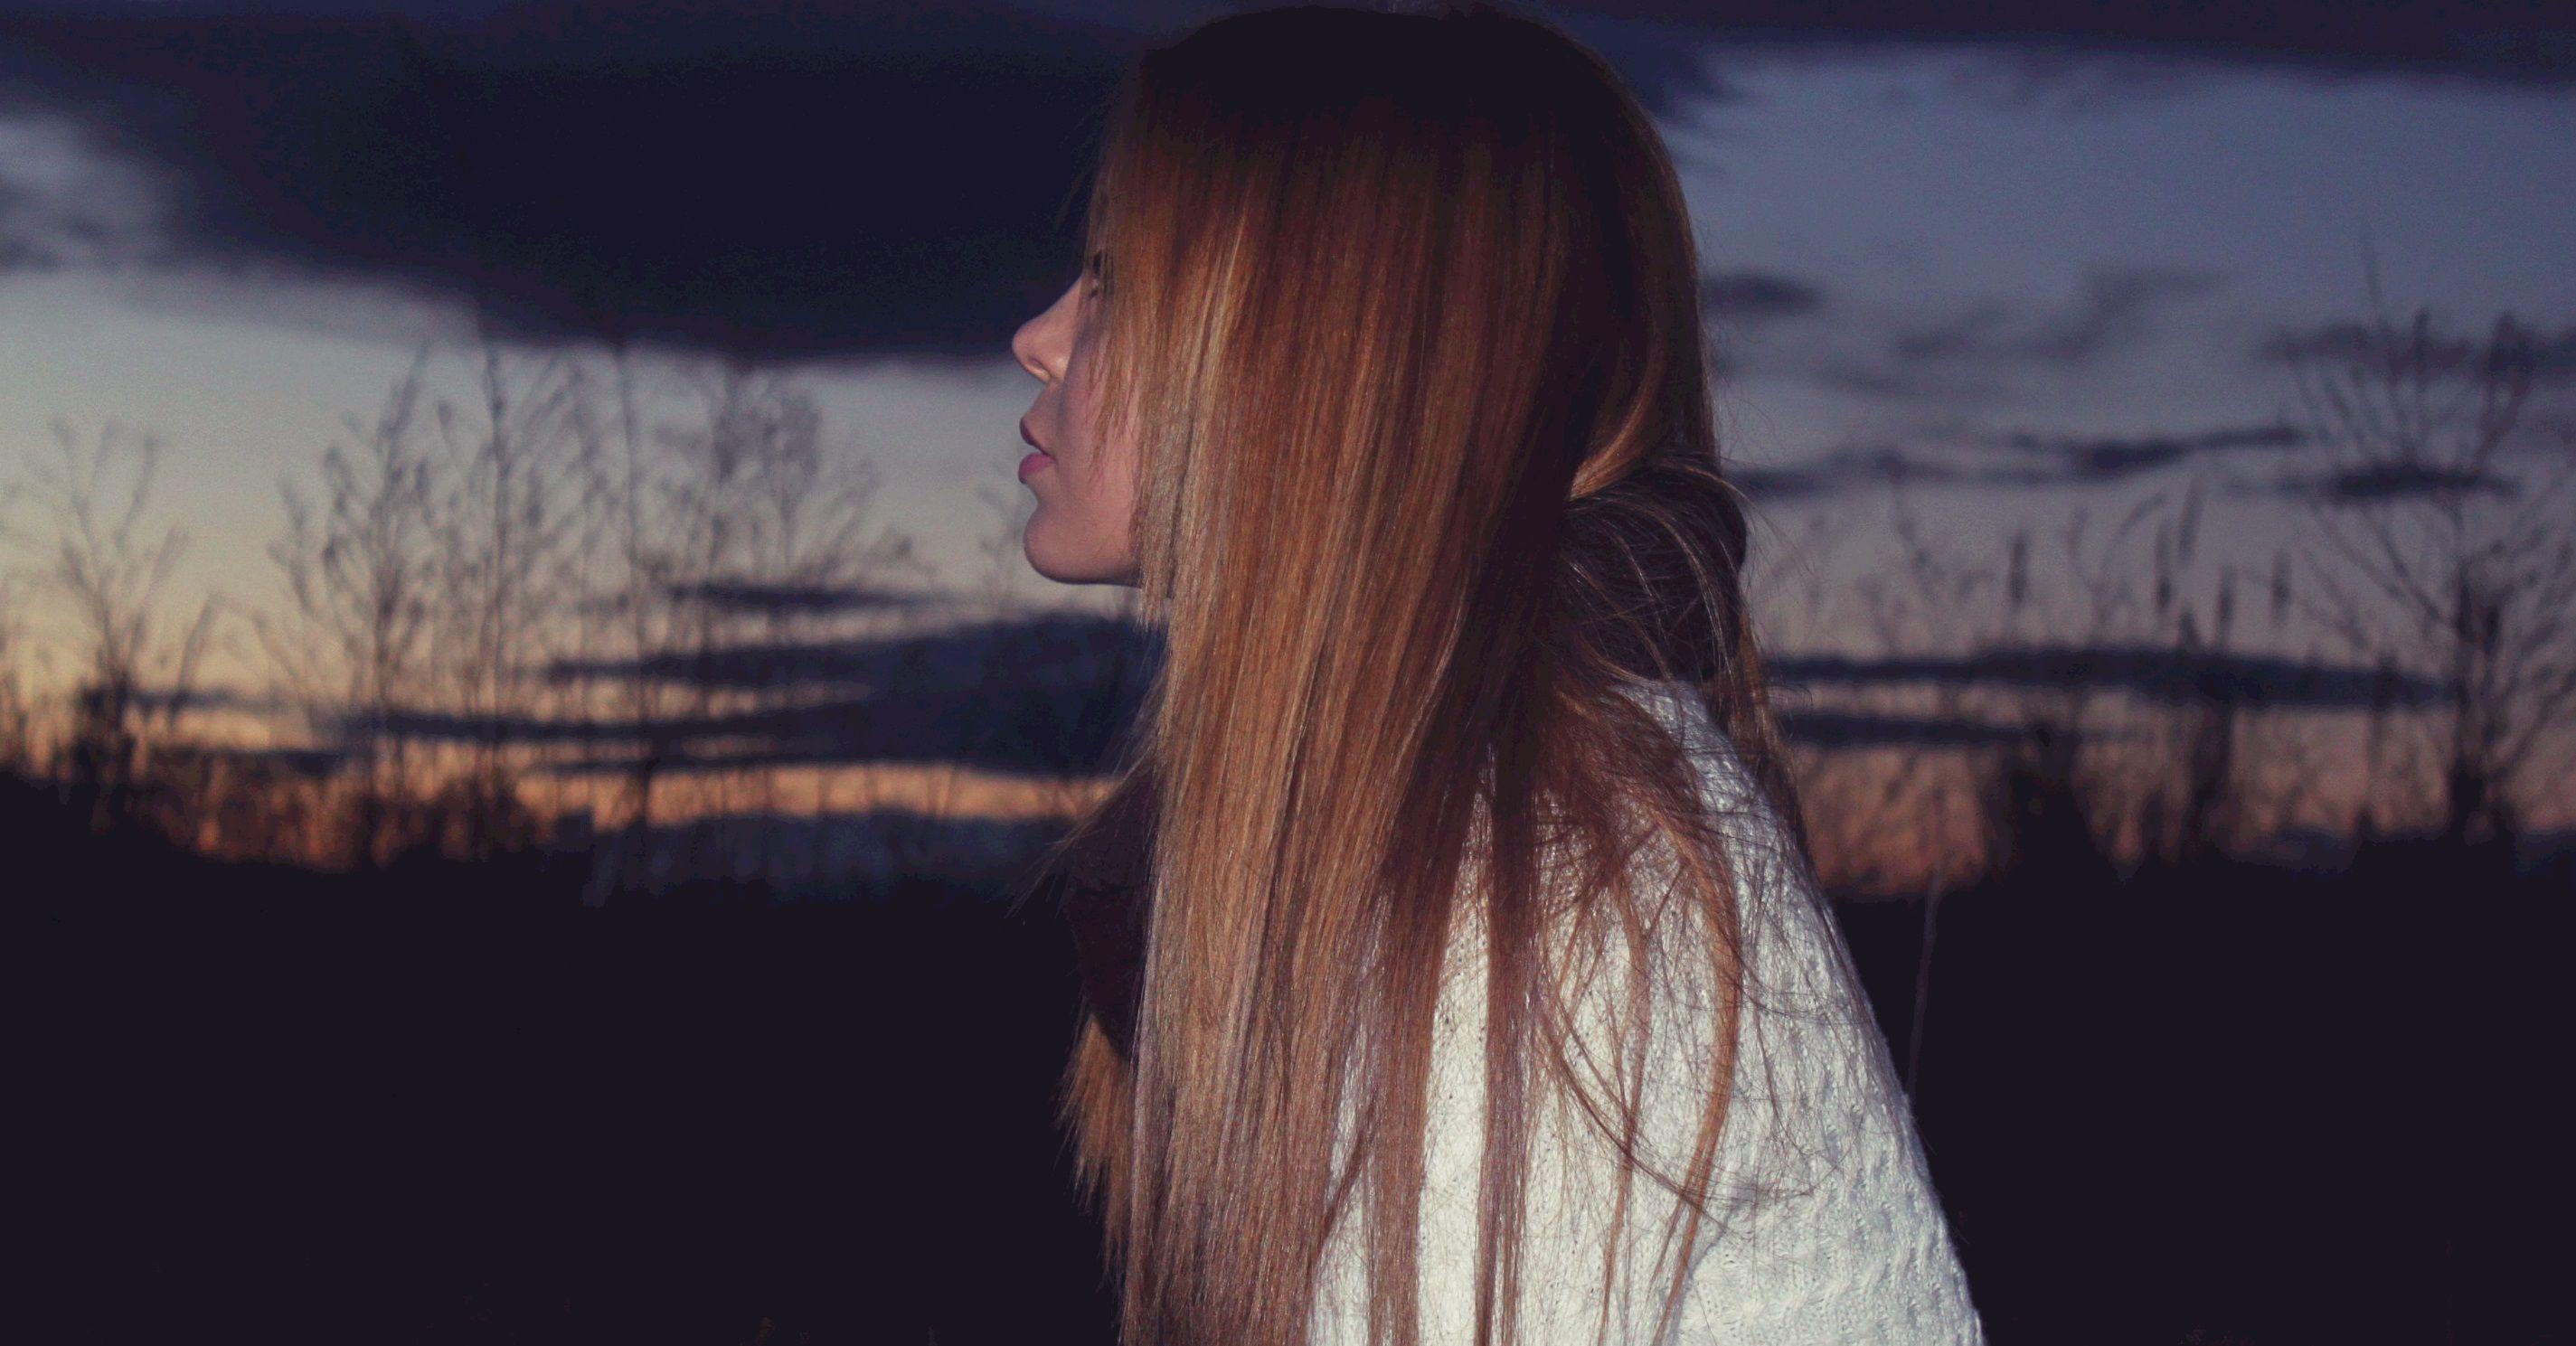 late afternoon, sunrise, amanecer,atardecer, me, yo, raquel imrj, girl, blonde,rubia